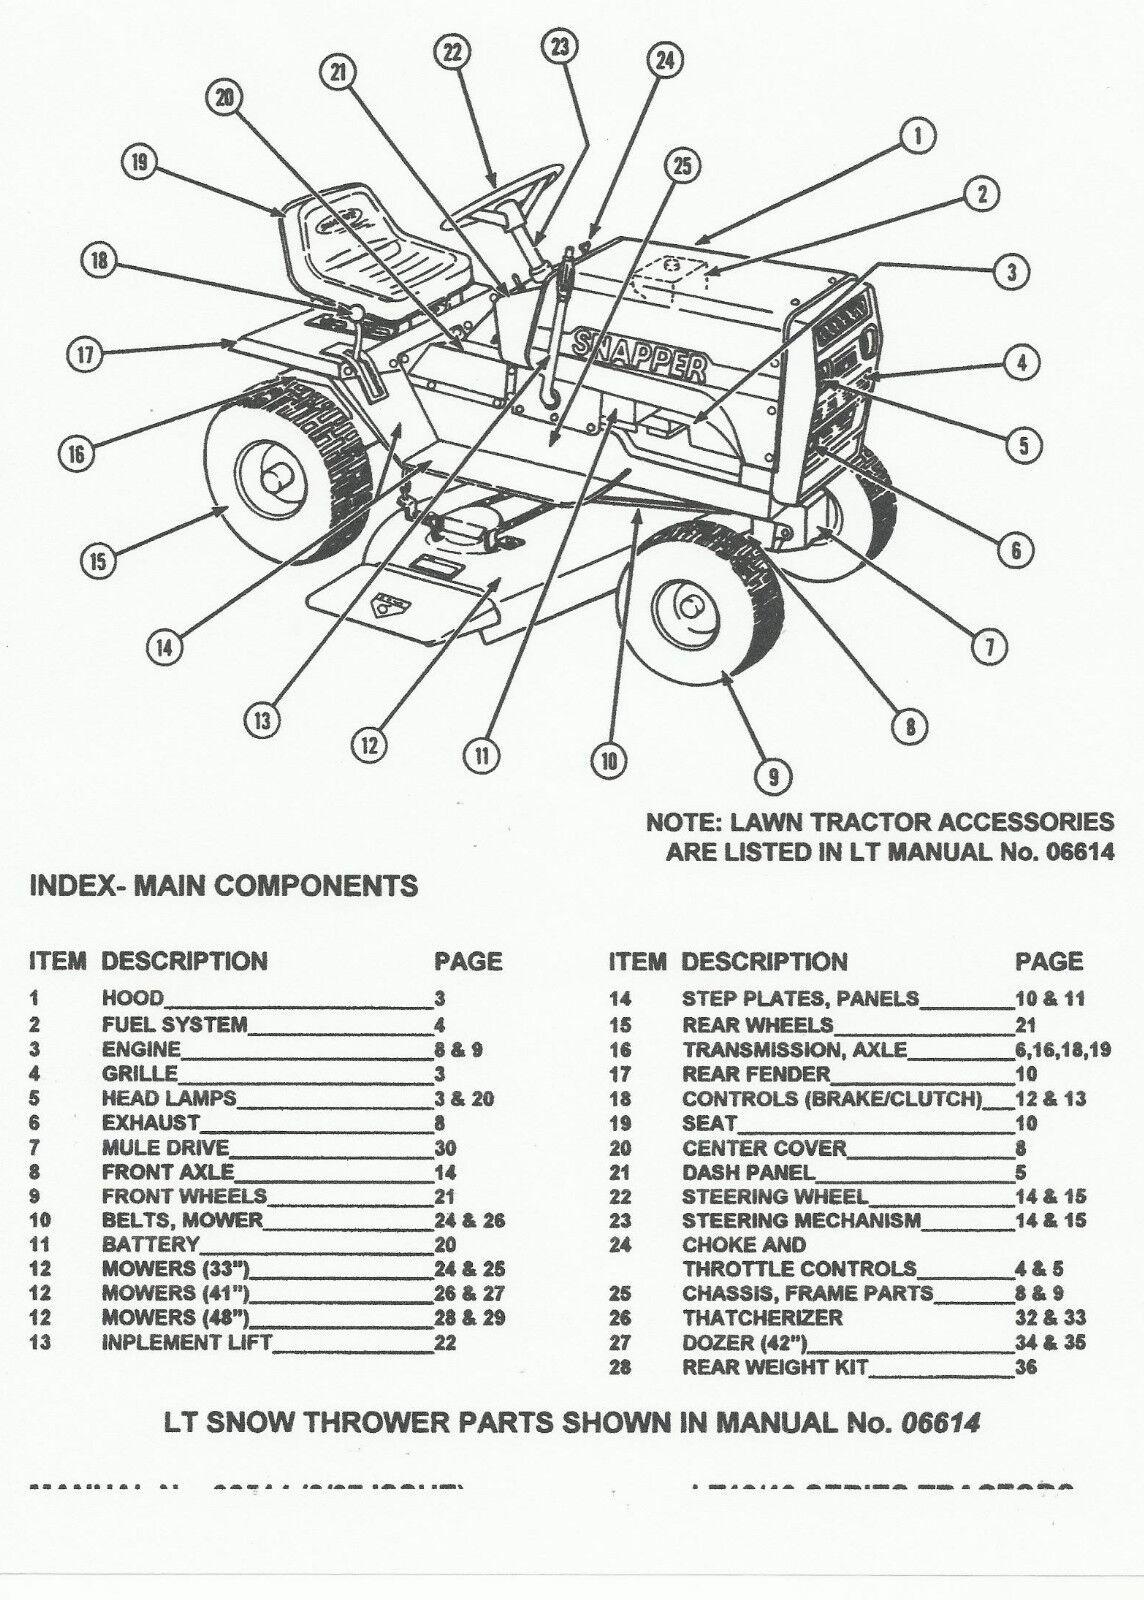 porsche 944 sunroof wiring diagram trailer 7 pin 5 wires australia 1987 engine html imageresizertool com